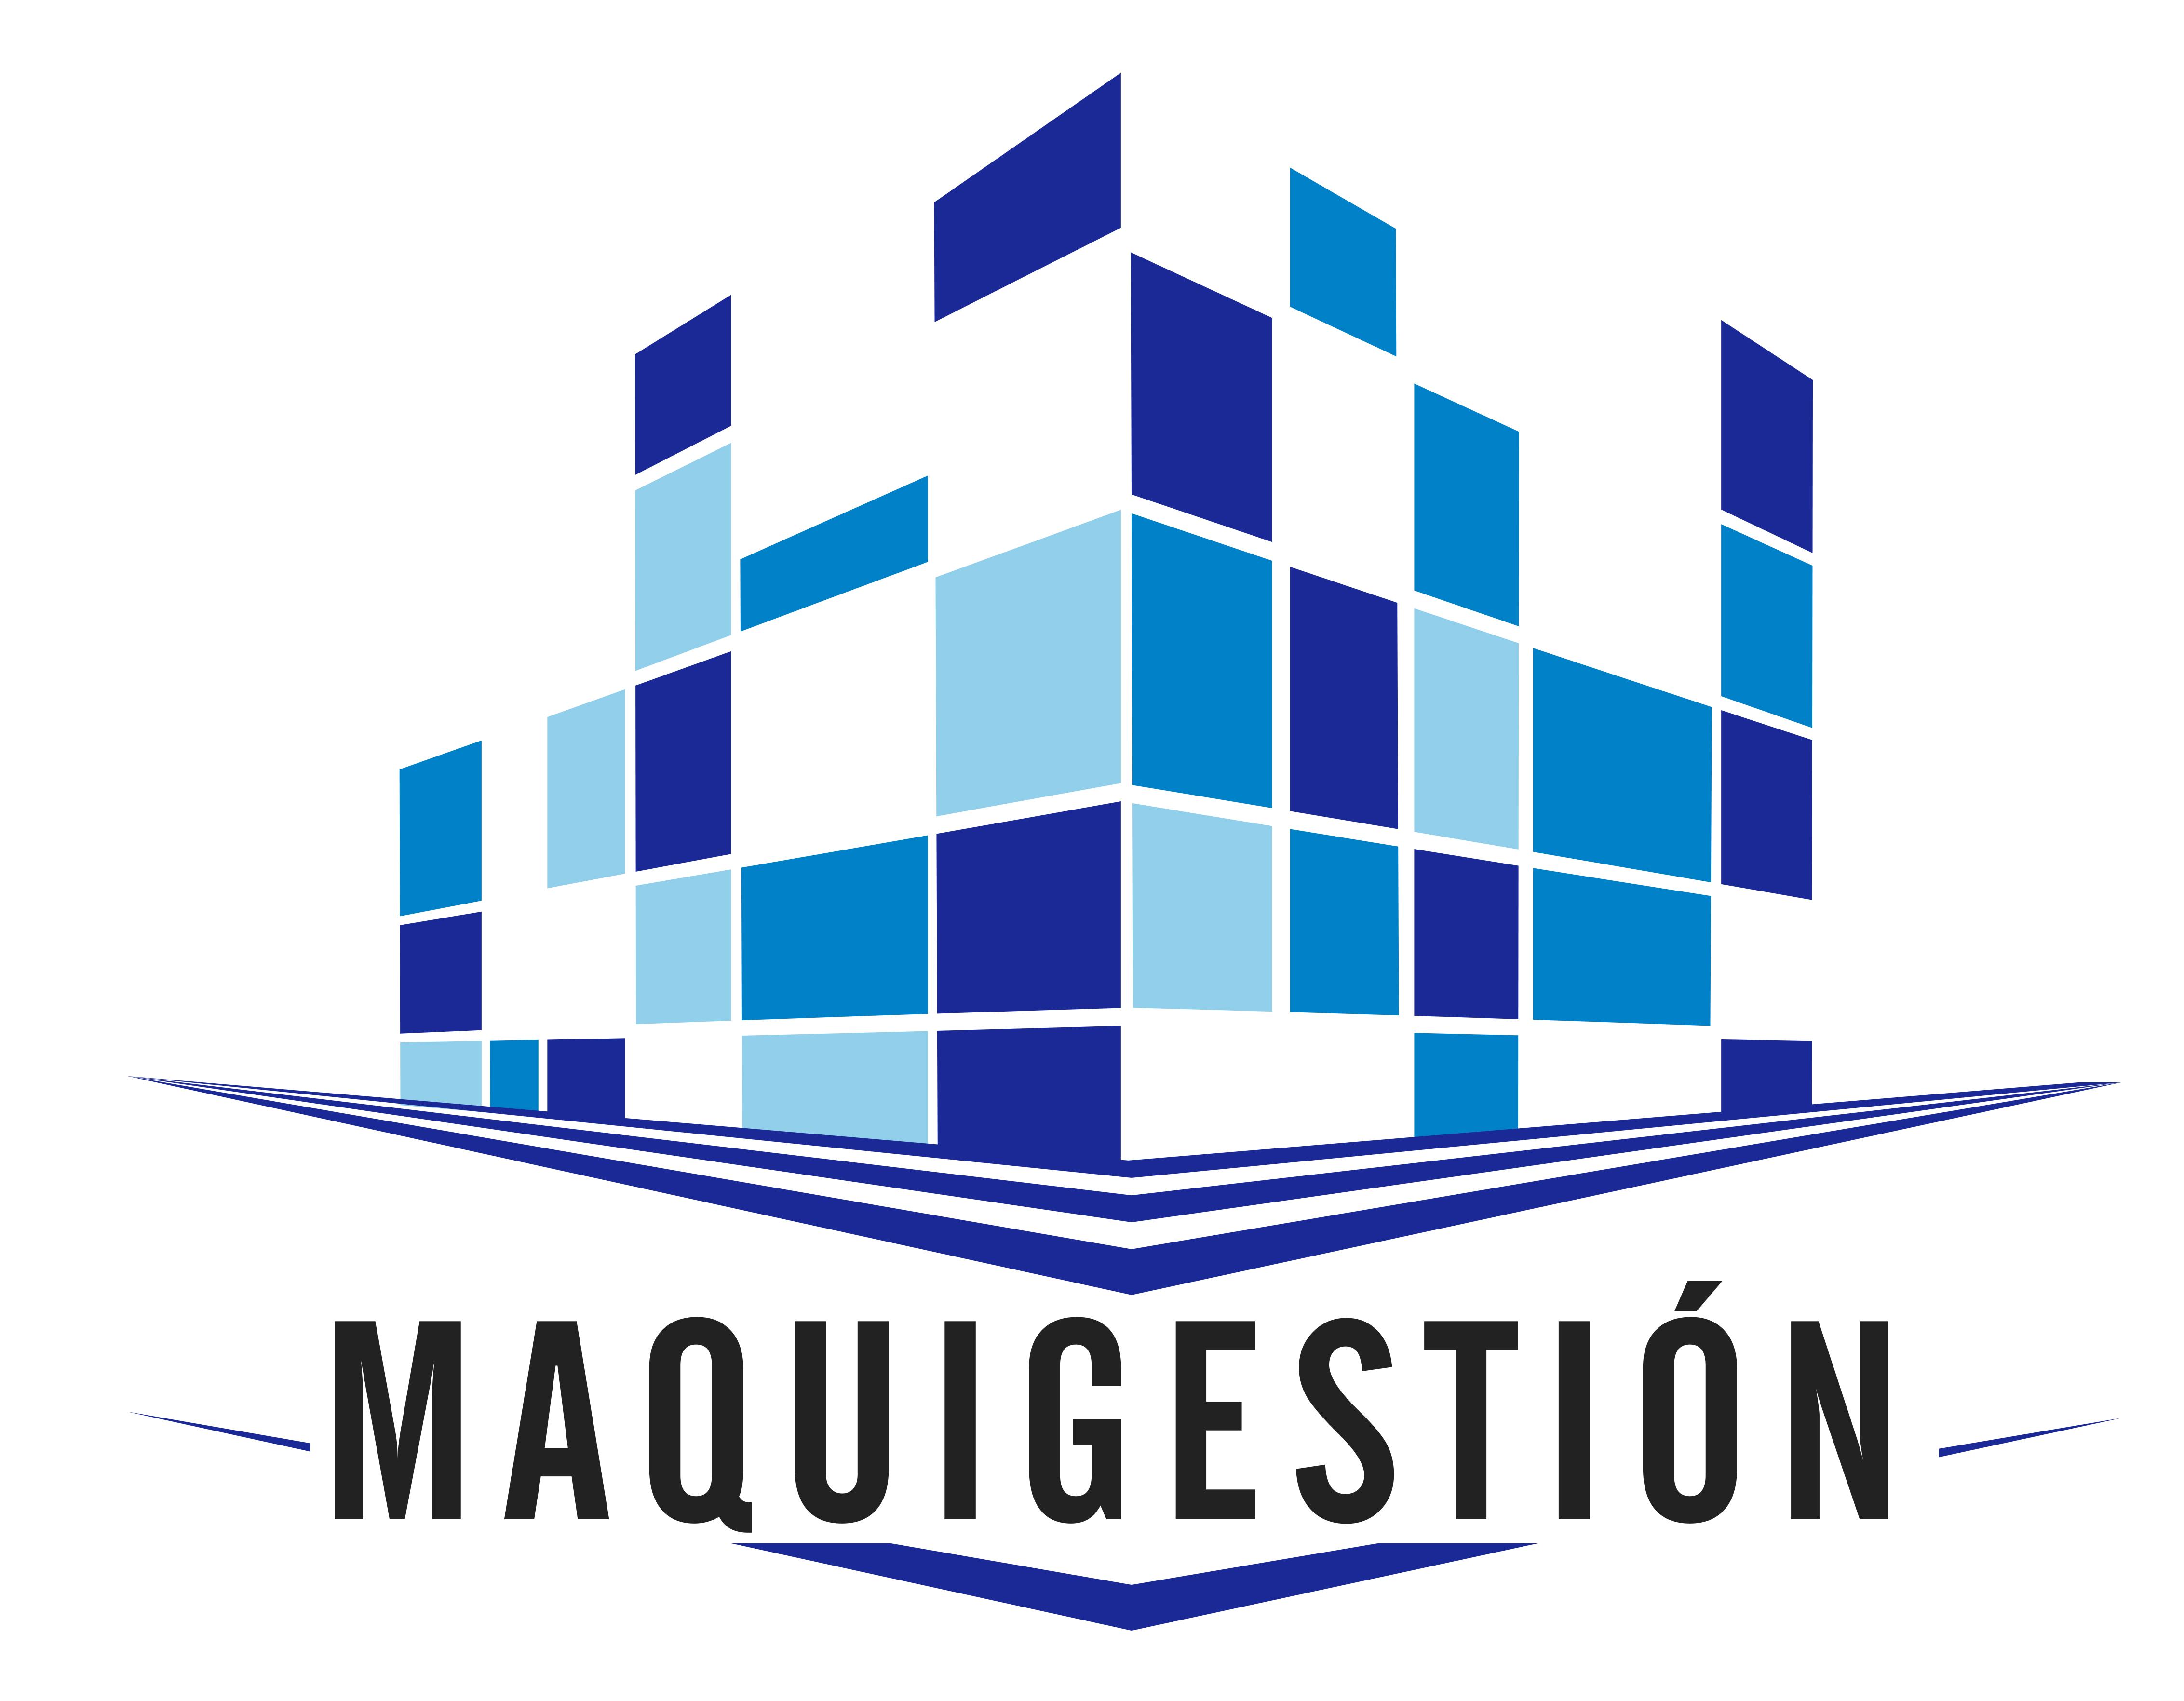 Maquigestión Andaelec Cádiz